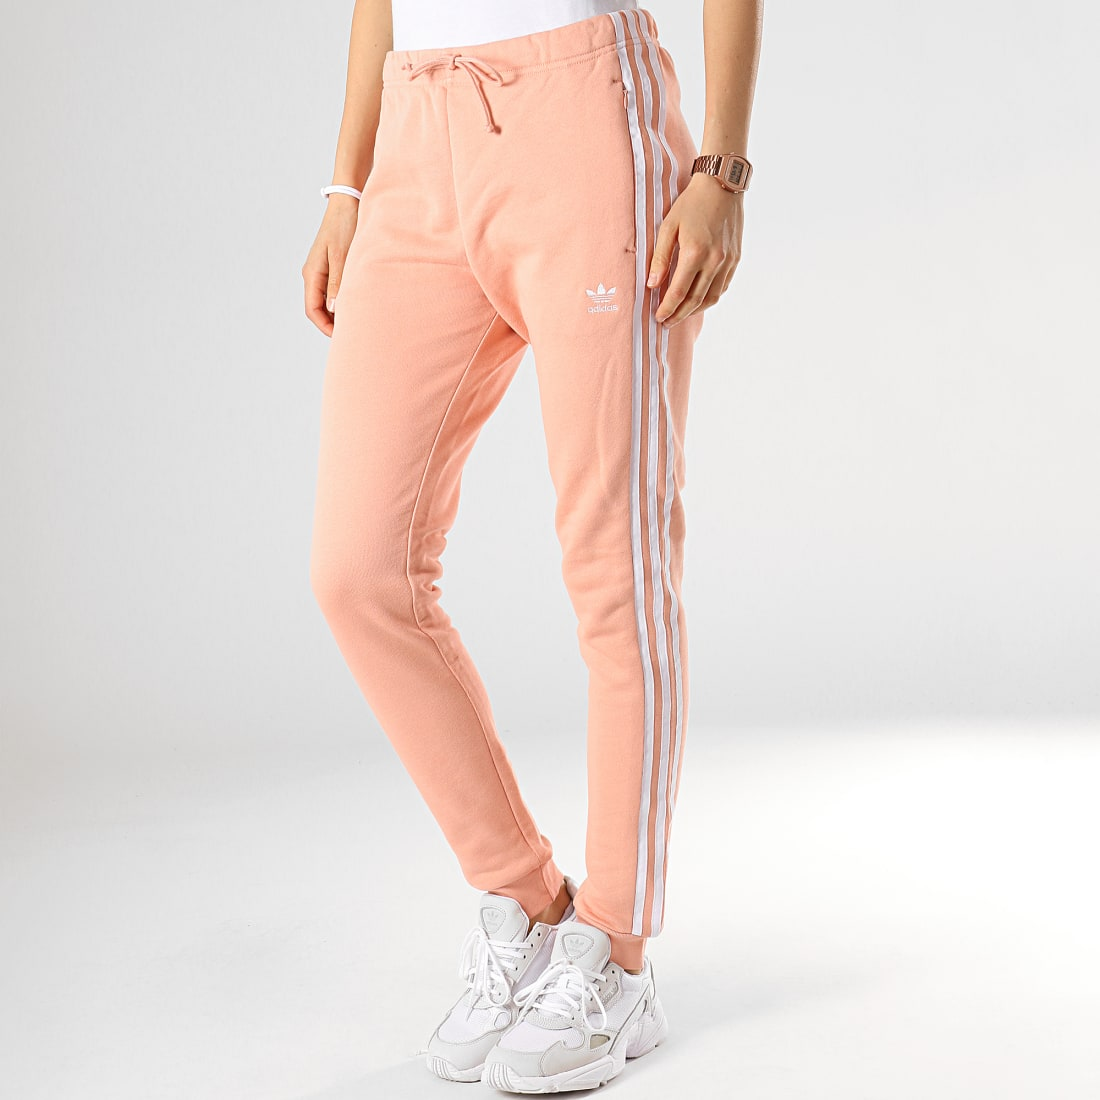 adidas - Pantalon Jogging Femme Avec Bandes Regular DV2600 ...